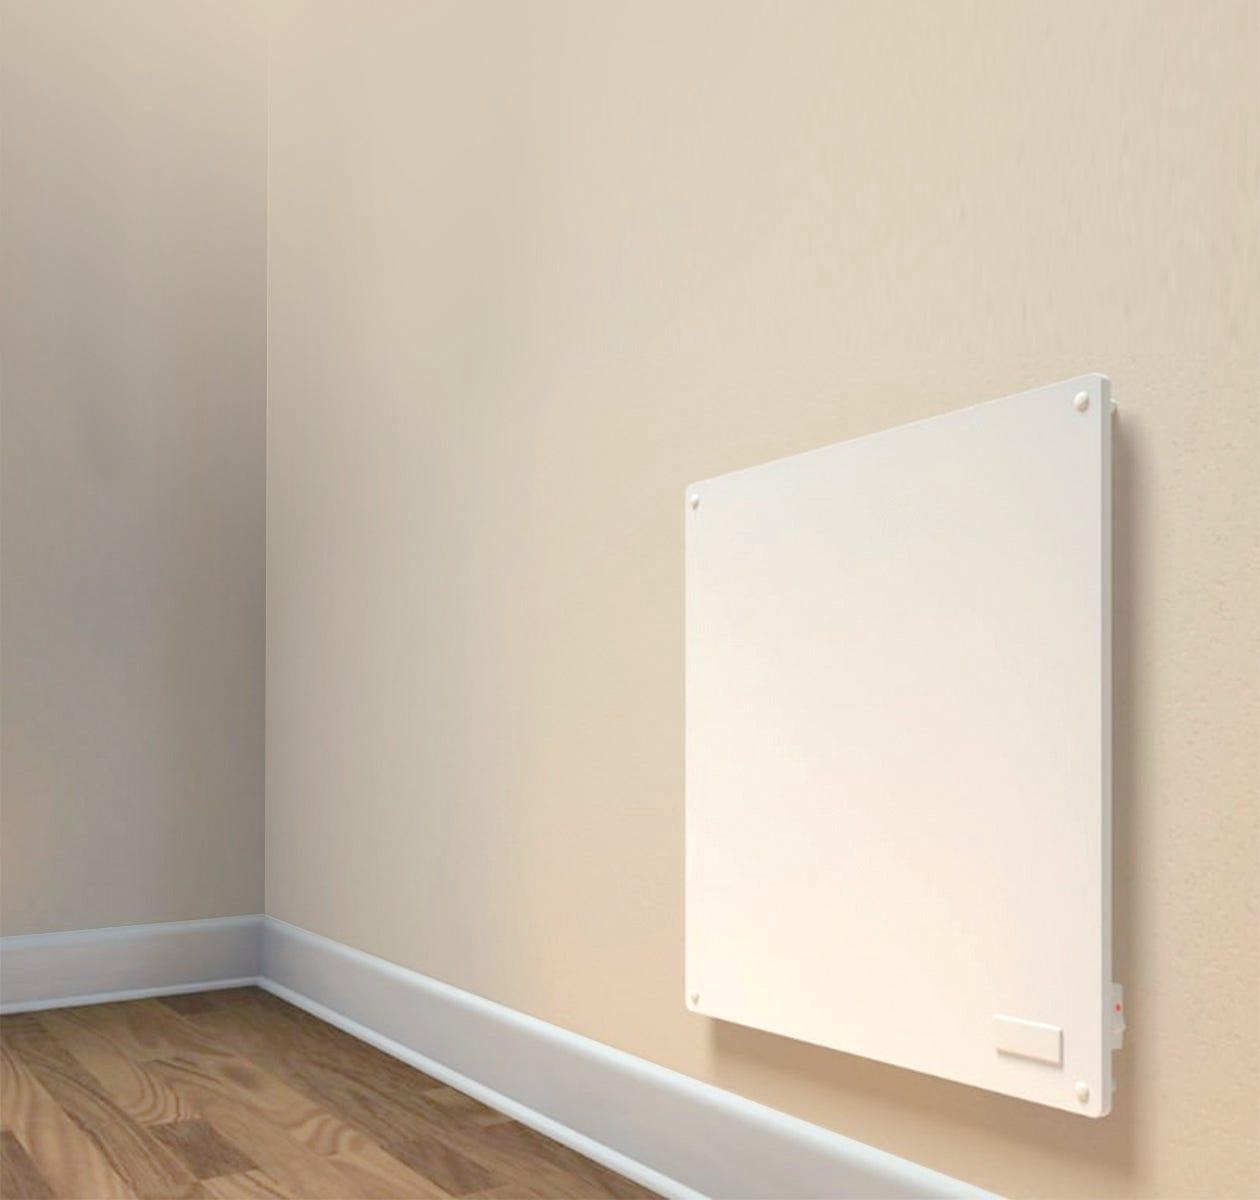 Calentador de panel para pared Amaze Heater, 400 watts